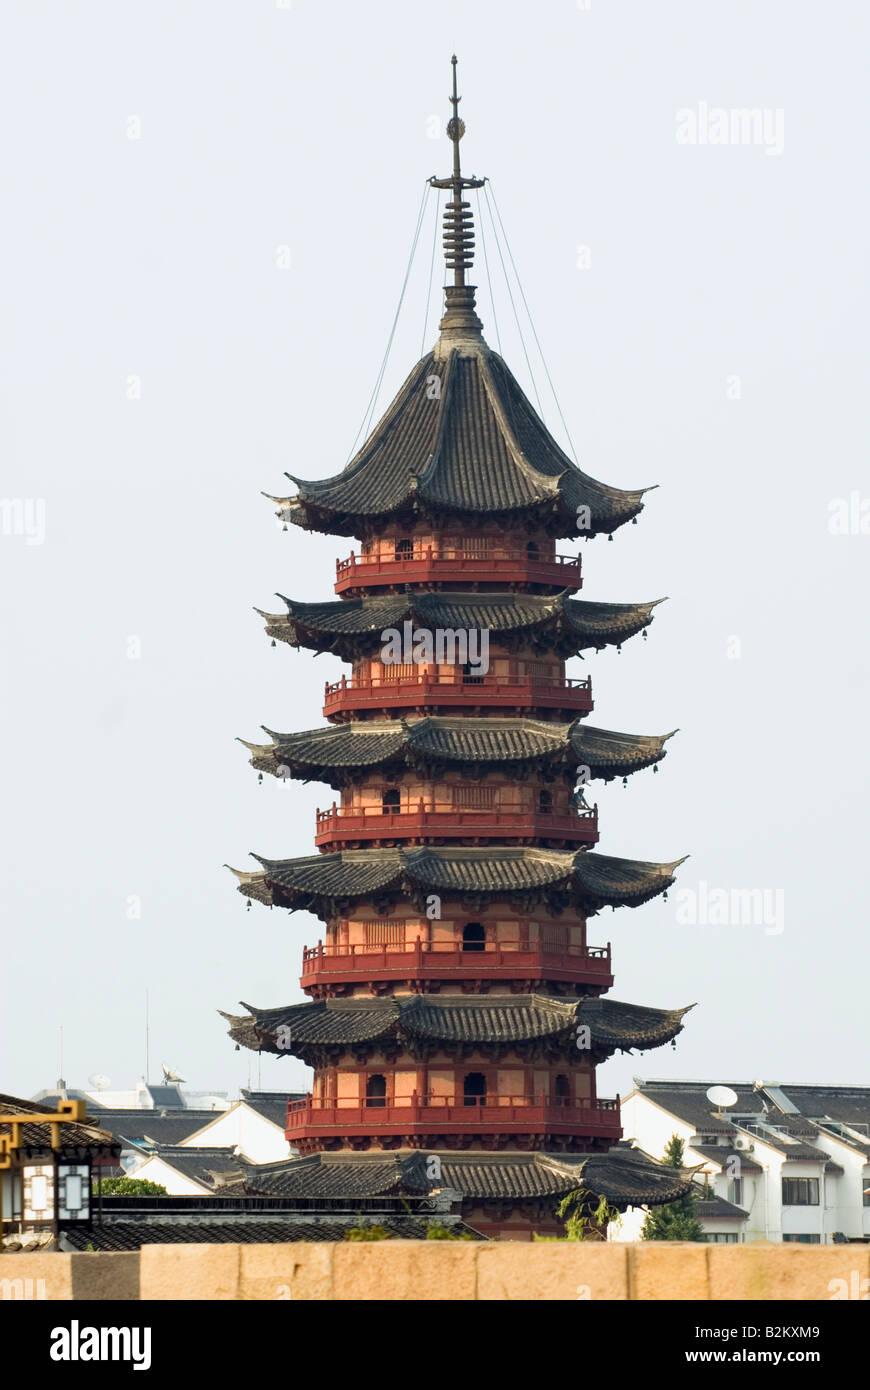 China, Suzhou, Ruiguang Pagoda, Auspicious Light Pagoda, Panmen - Stock Image